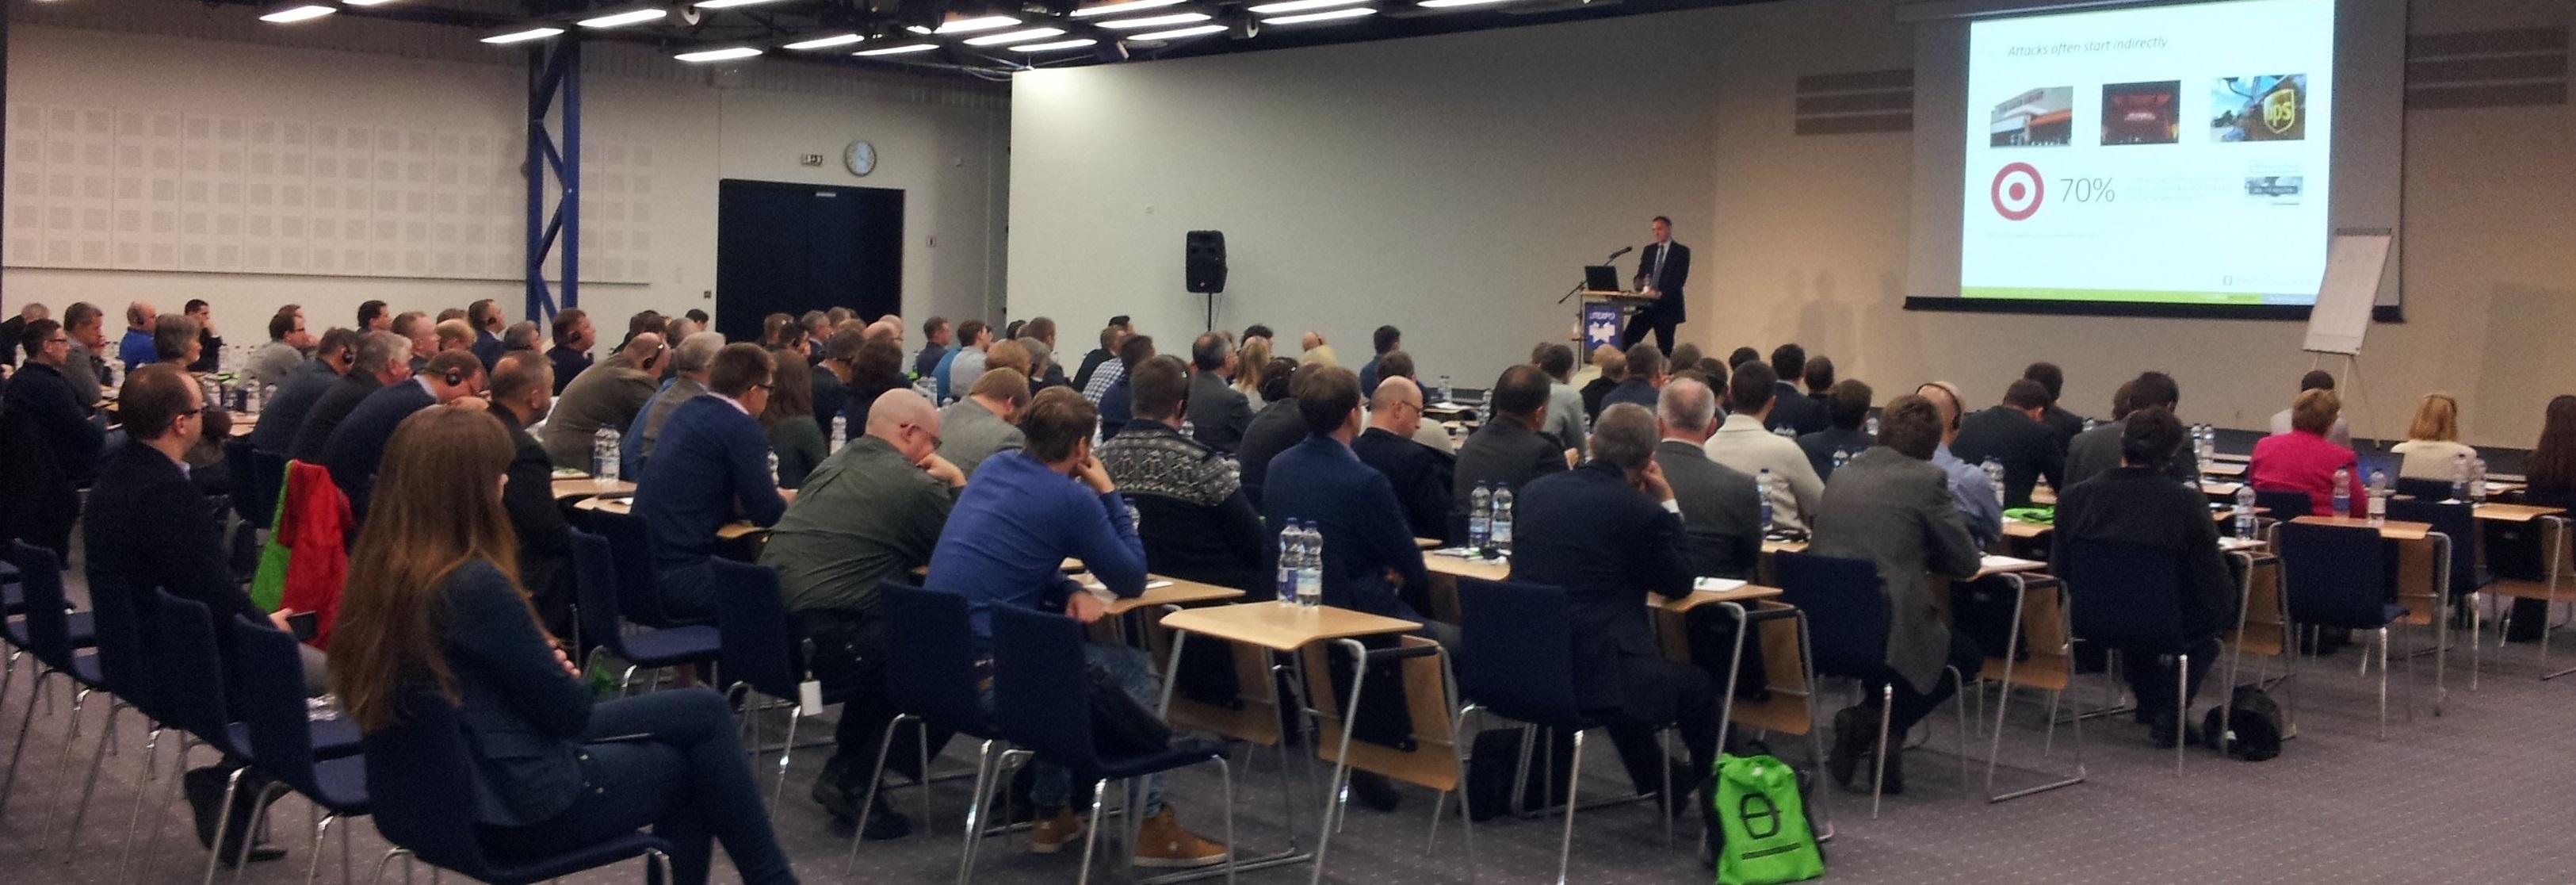 Seminarai / konferencijos